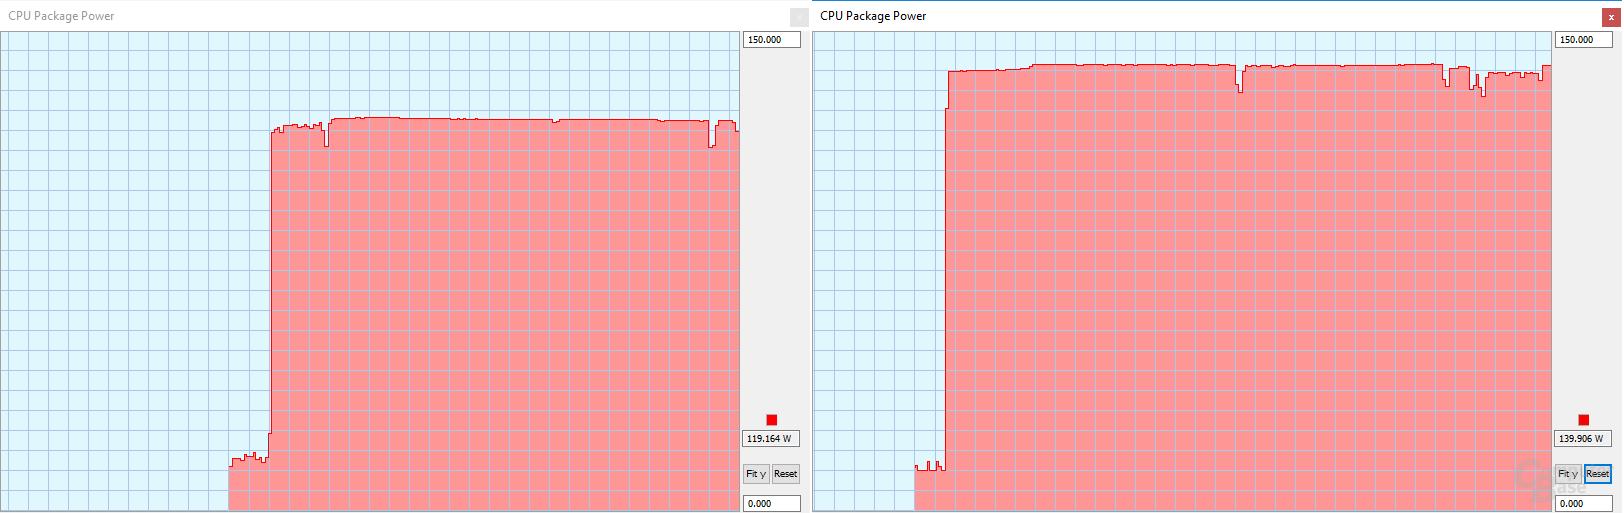 Intel Core i7-8700K, links Z370, rechts H370